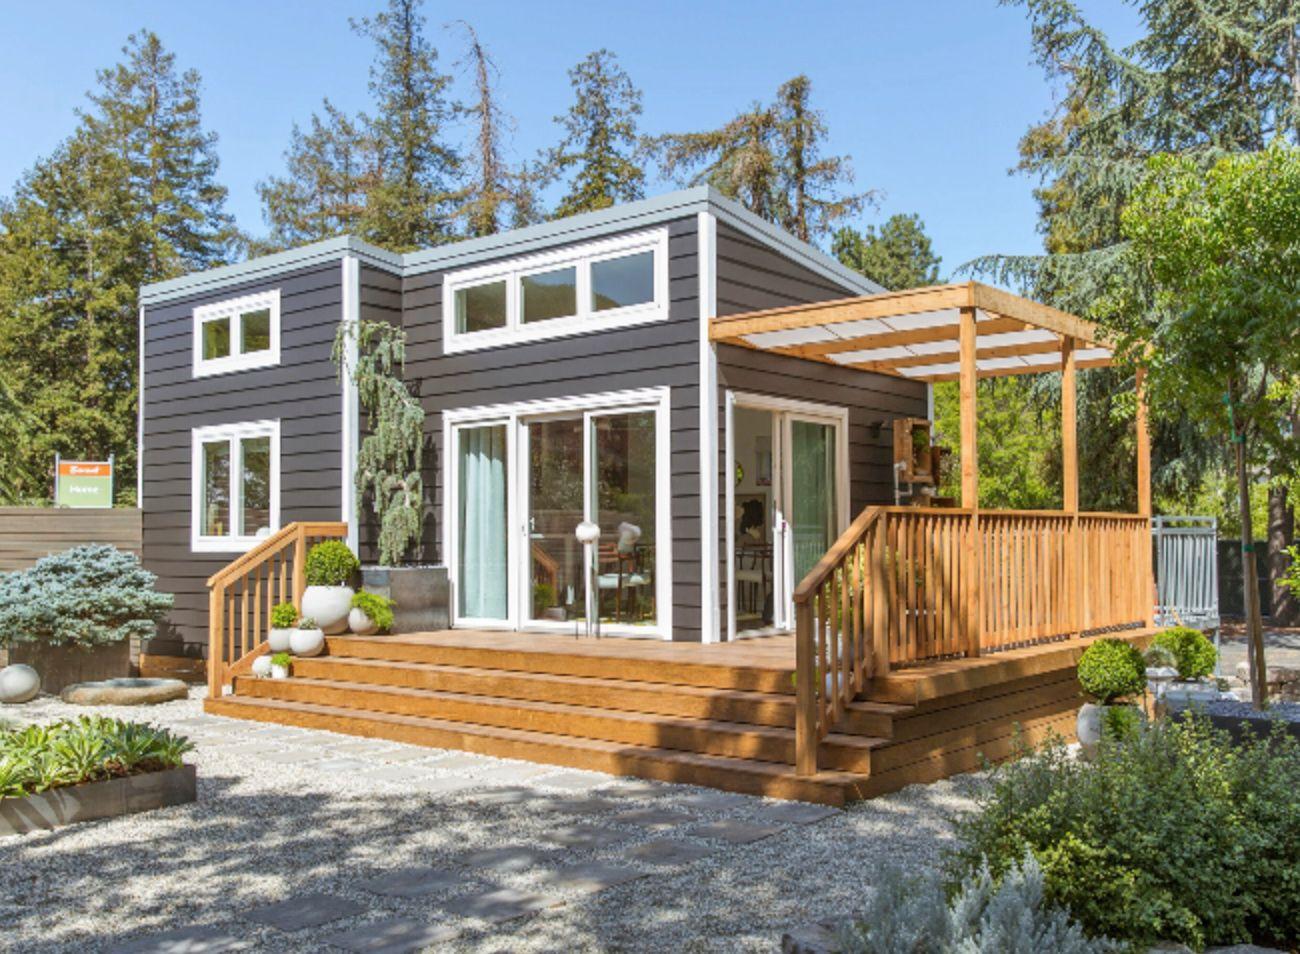 Sunset magazine 39 s charming cottage showcases inspiring for Sunset magazine house plans